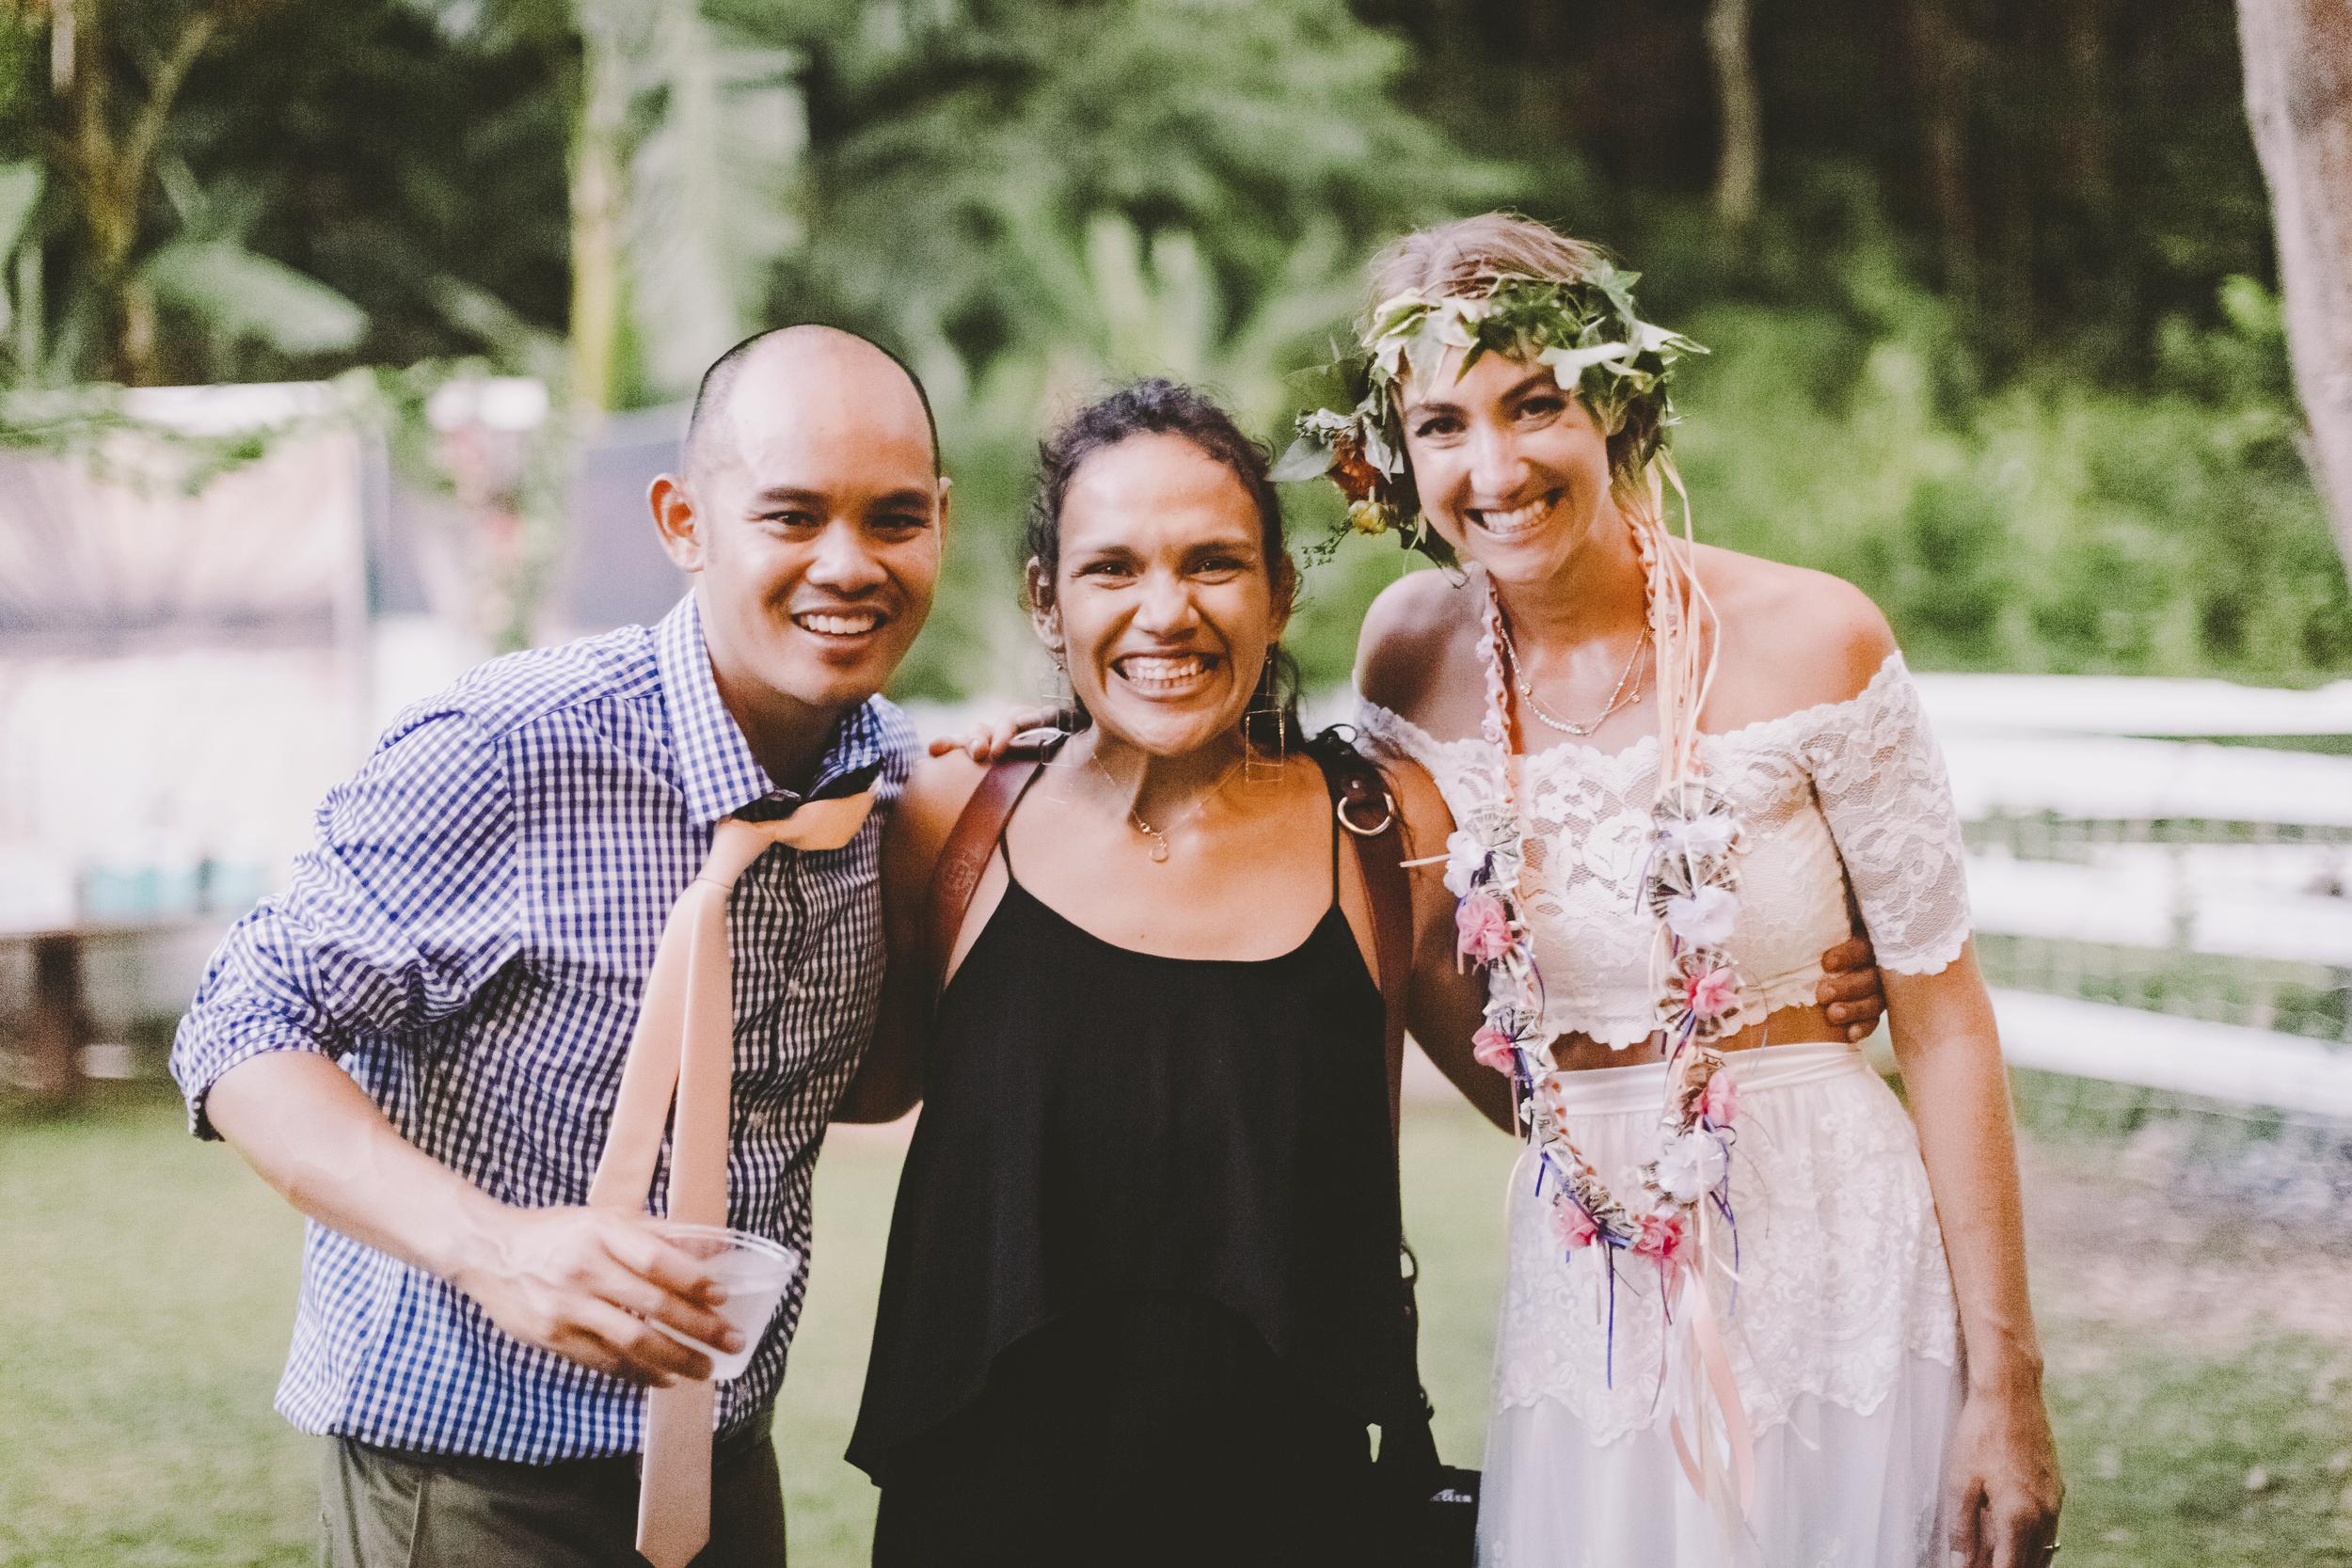 angie-diaz-photography-oahu-hawaii-wedding-tradewinds-ranch-115.jpg